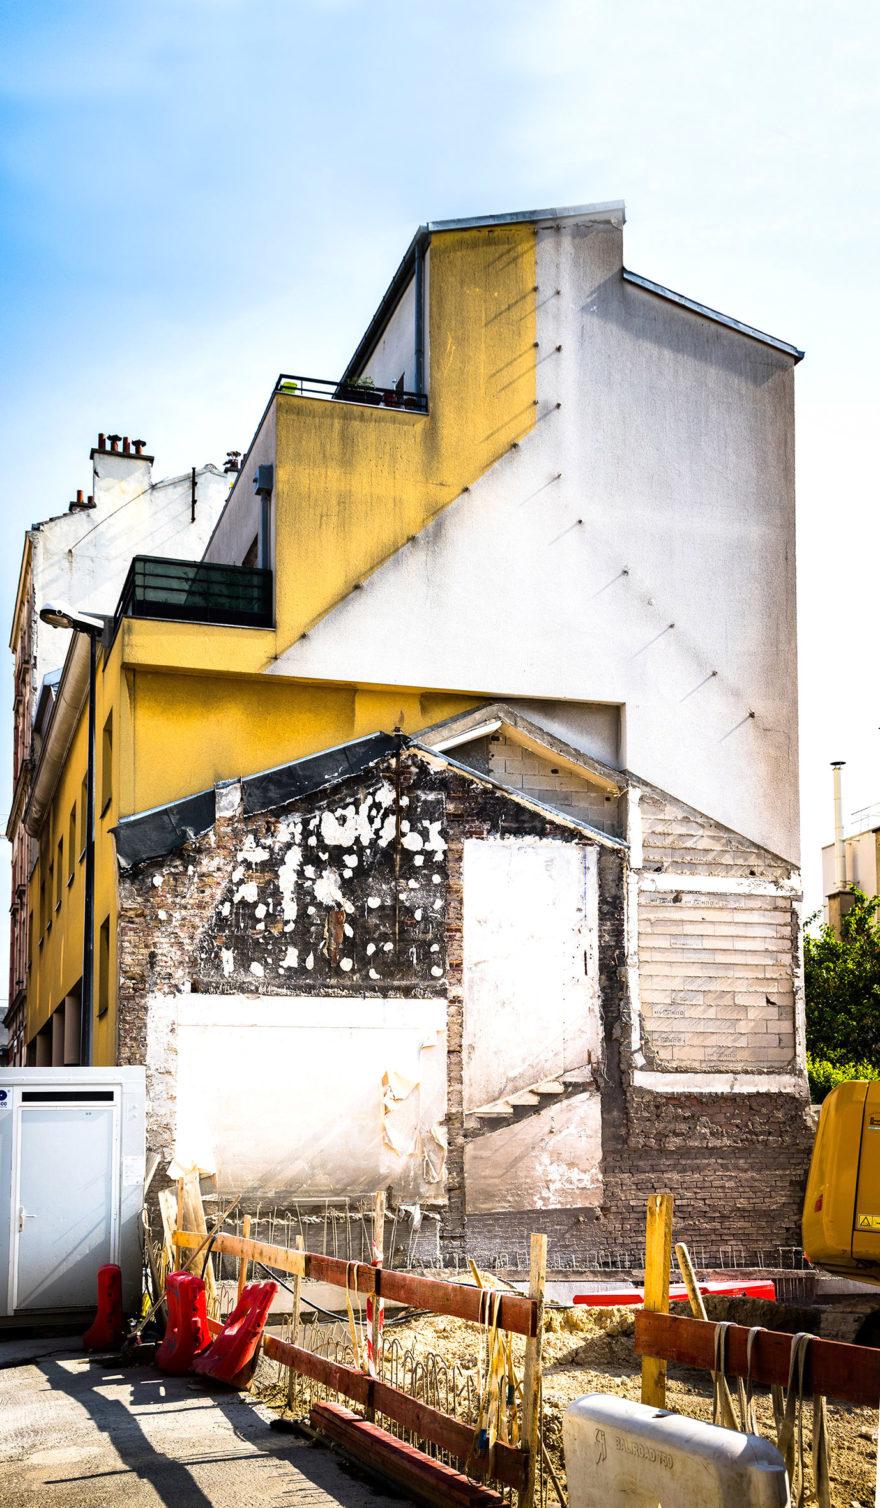 jessica servieres - fantasmagoria - strates de transformation urbaine